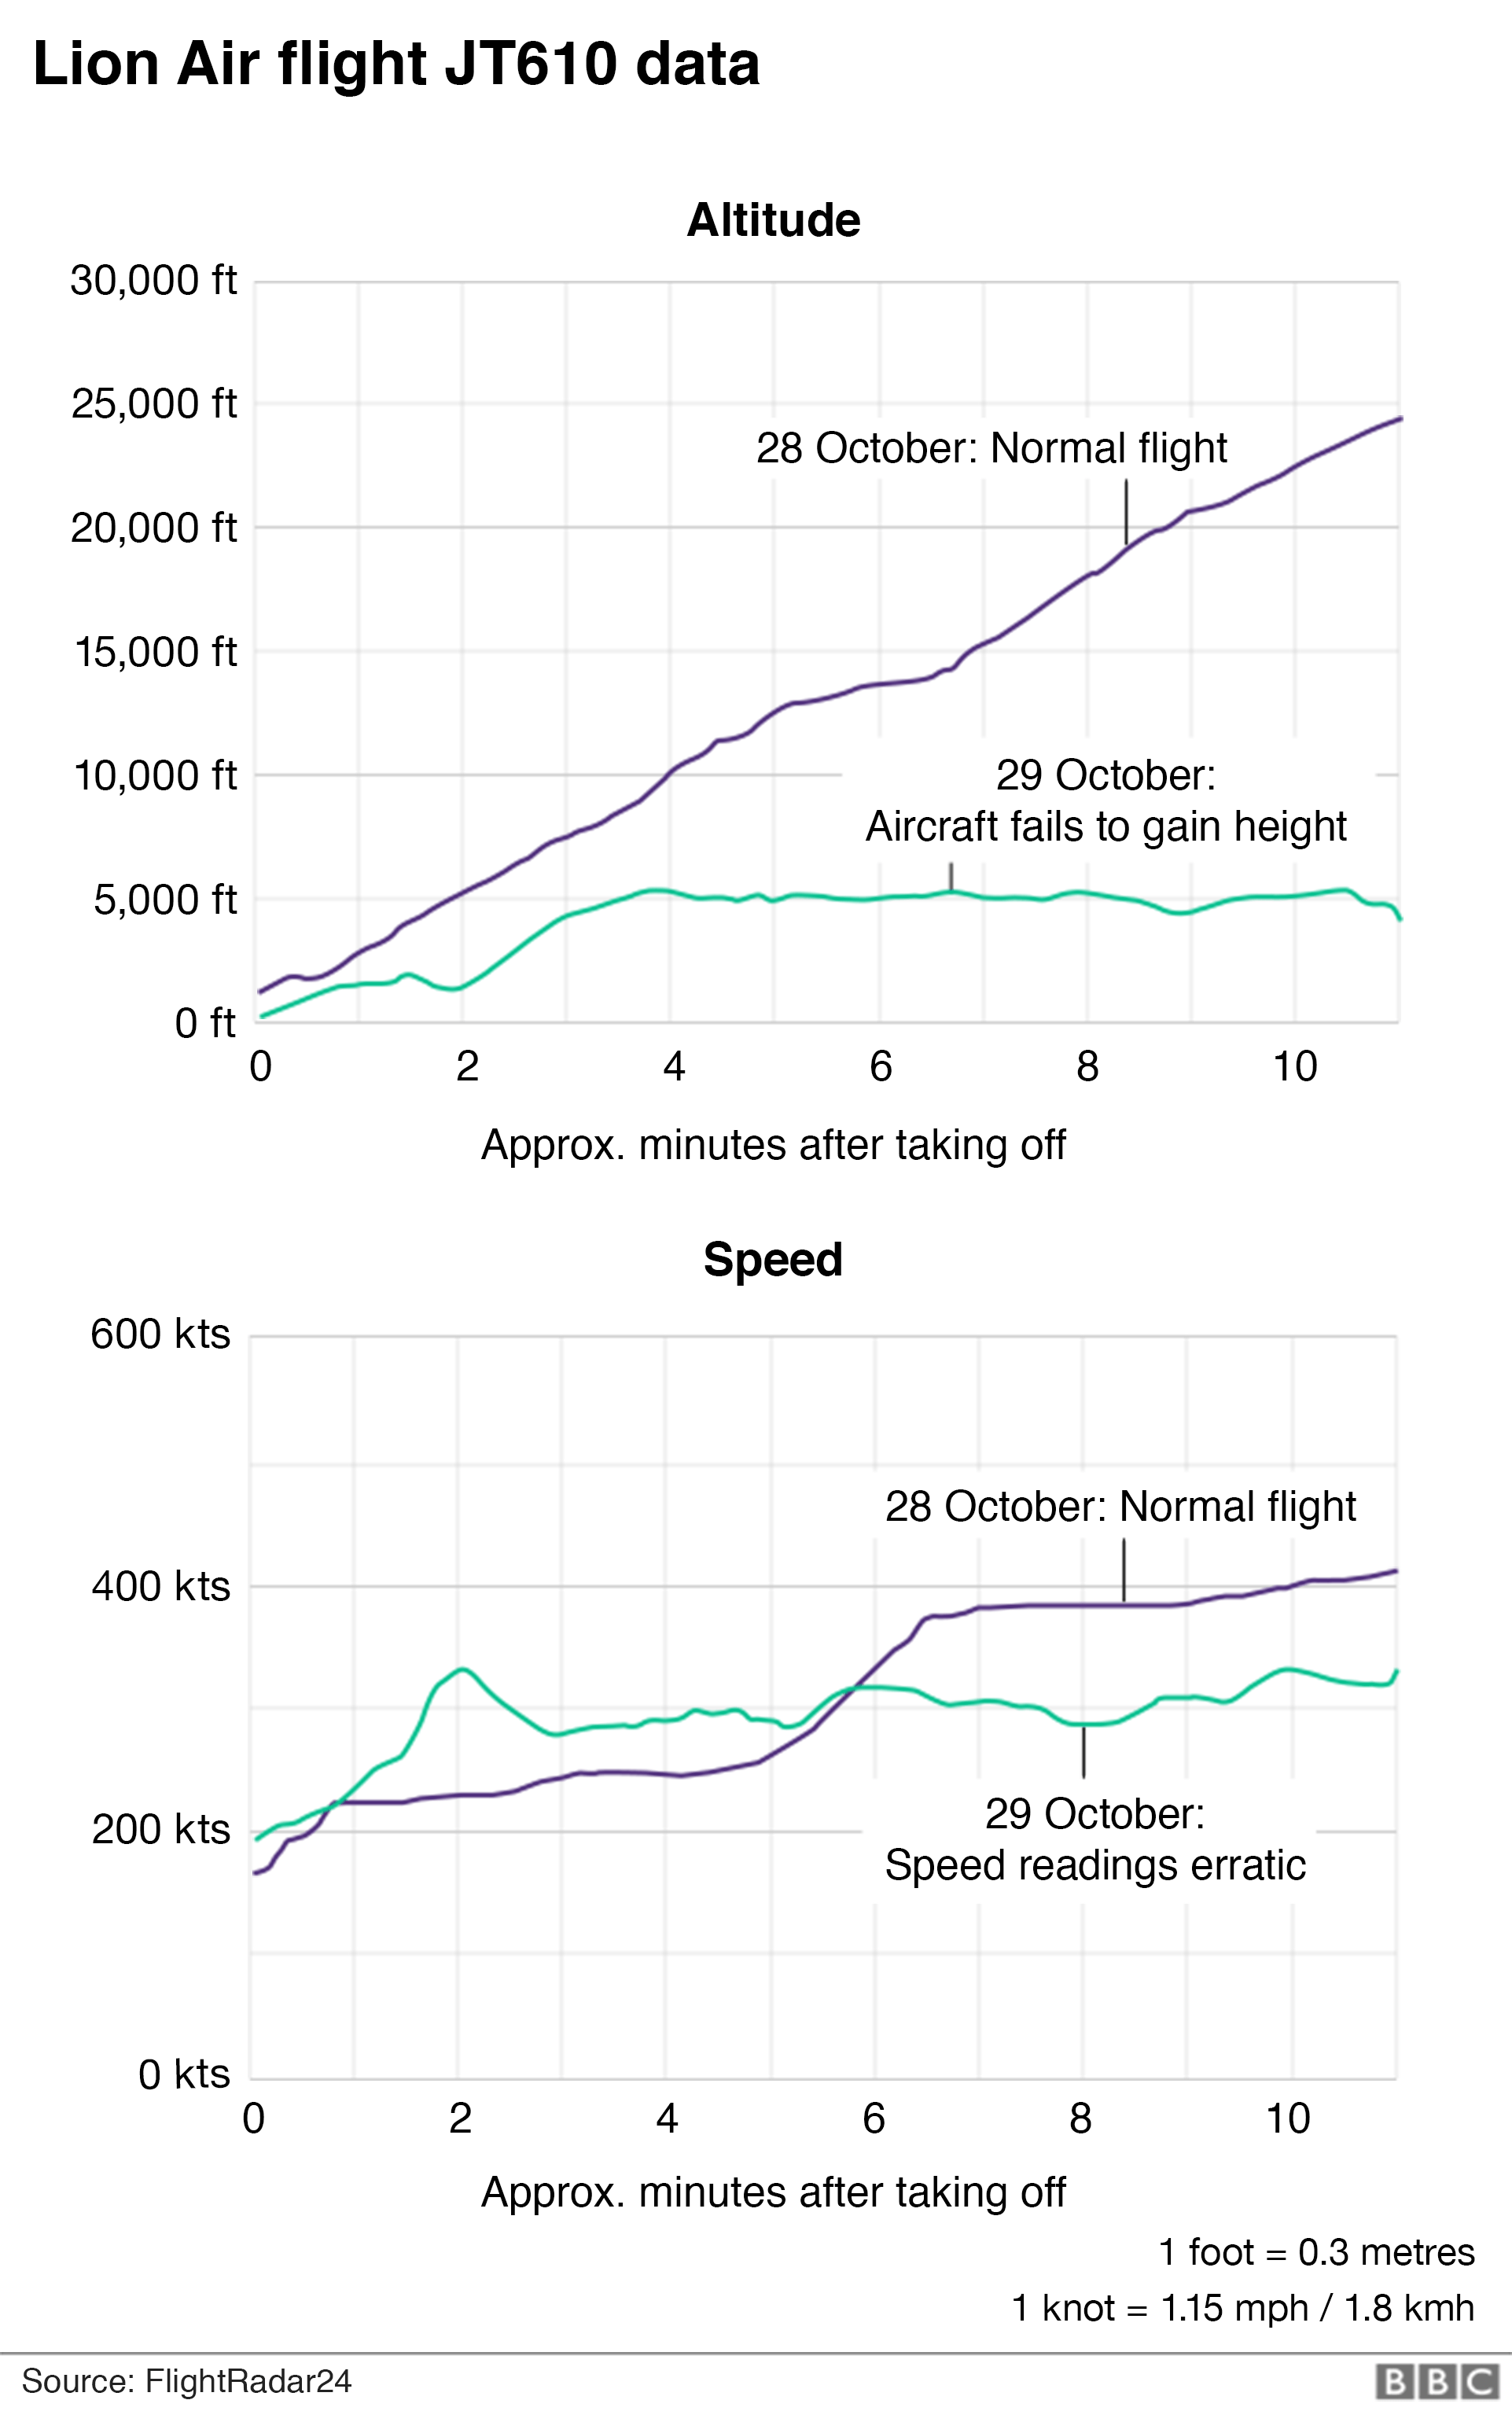 Chart showing flight data for Lion Air JT610